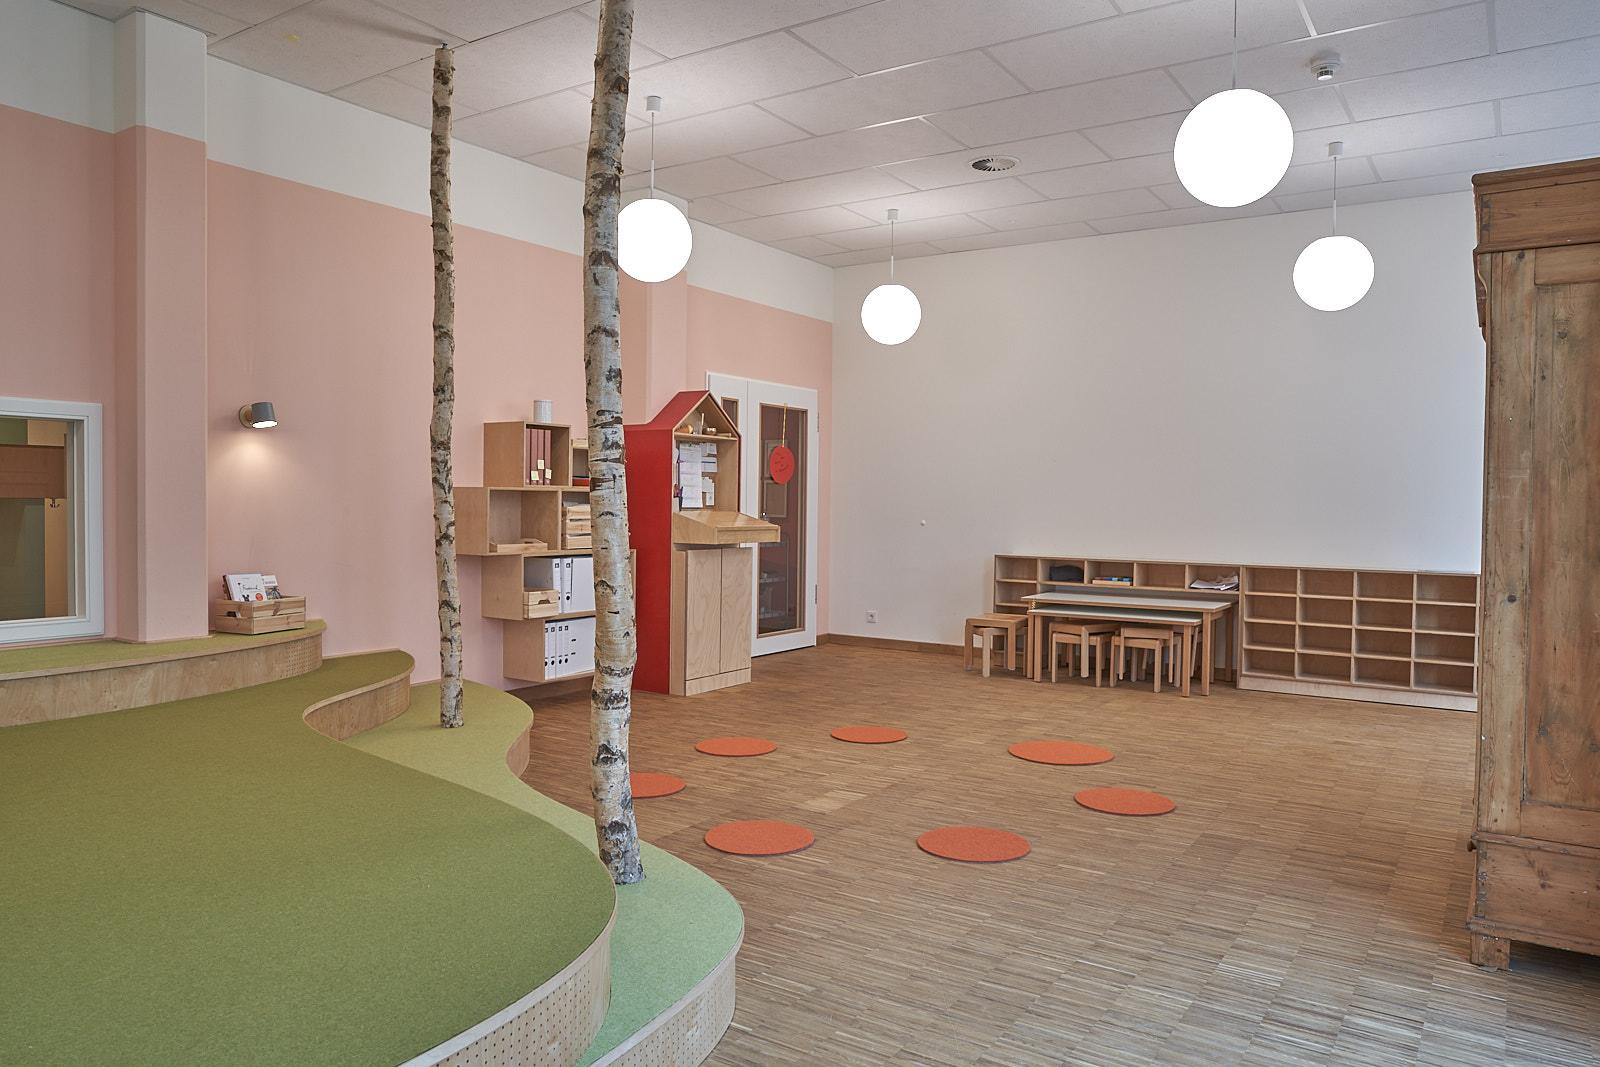 Hamburg, Neue Mitte Altona, Moete, Kita Sandvika, Bauraum, Baupodest, Rollenspiel, Kita, Kindergarten, Kindertagesstätte, Krippe 03.jpg